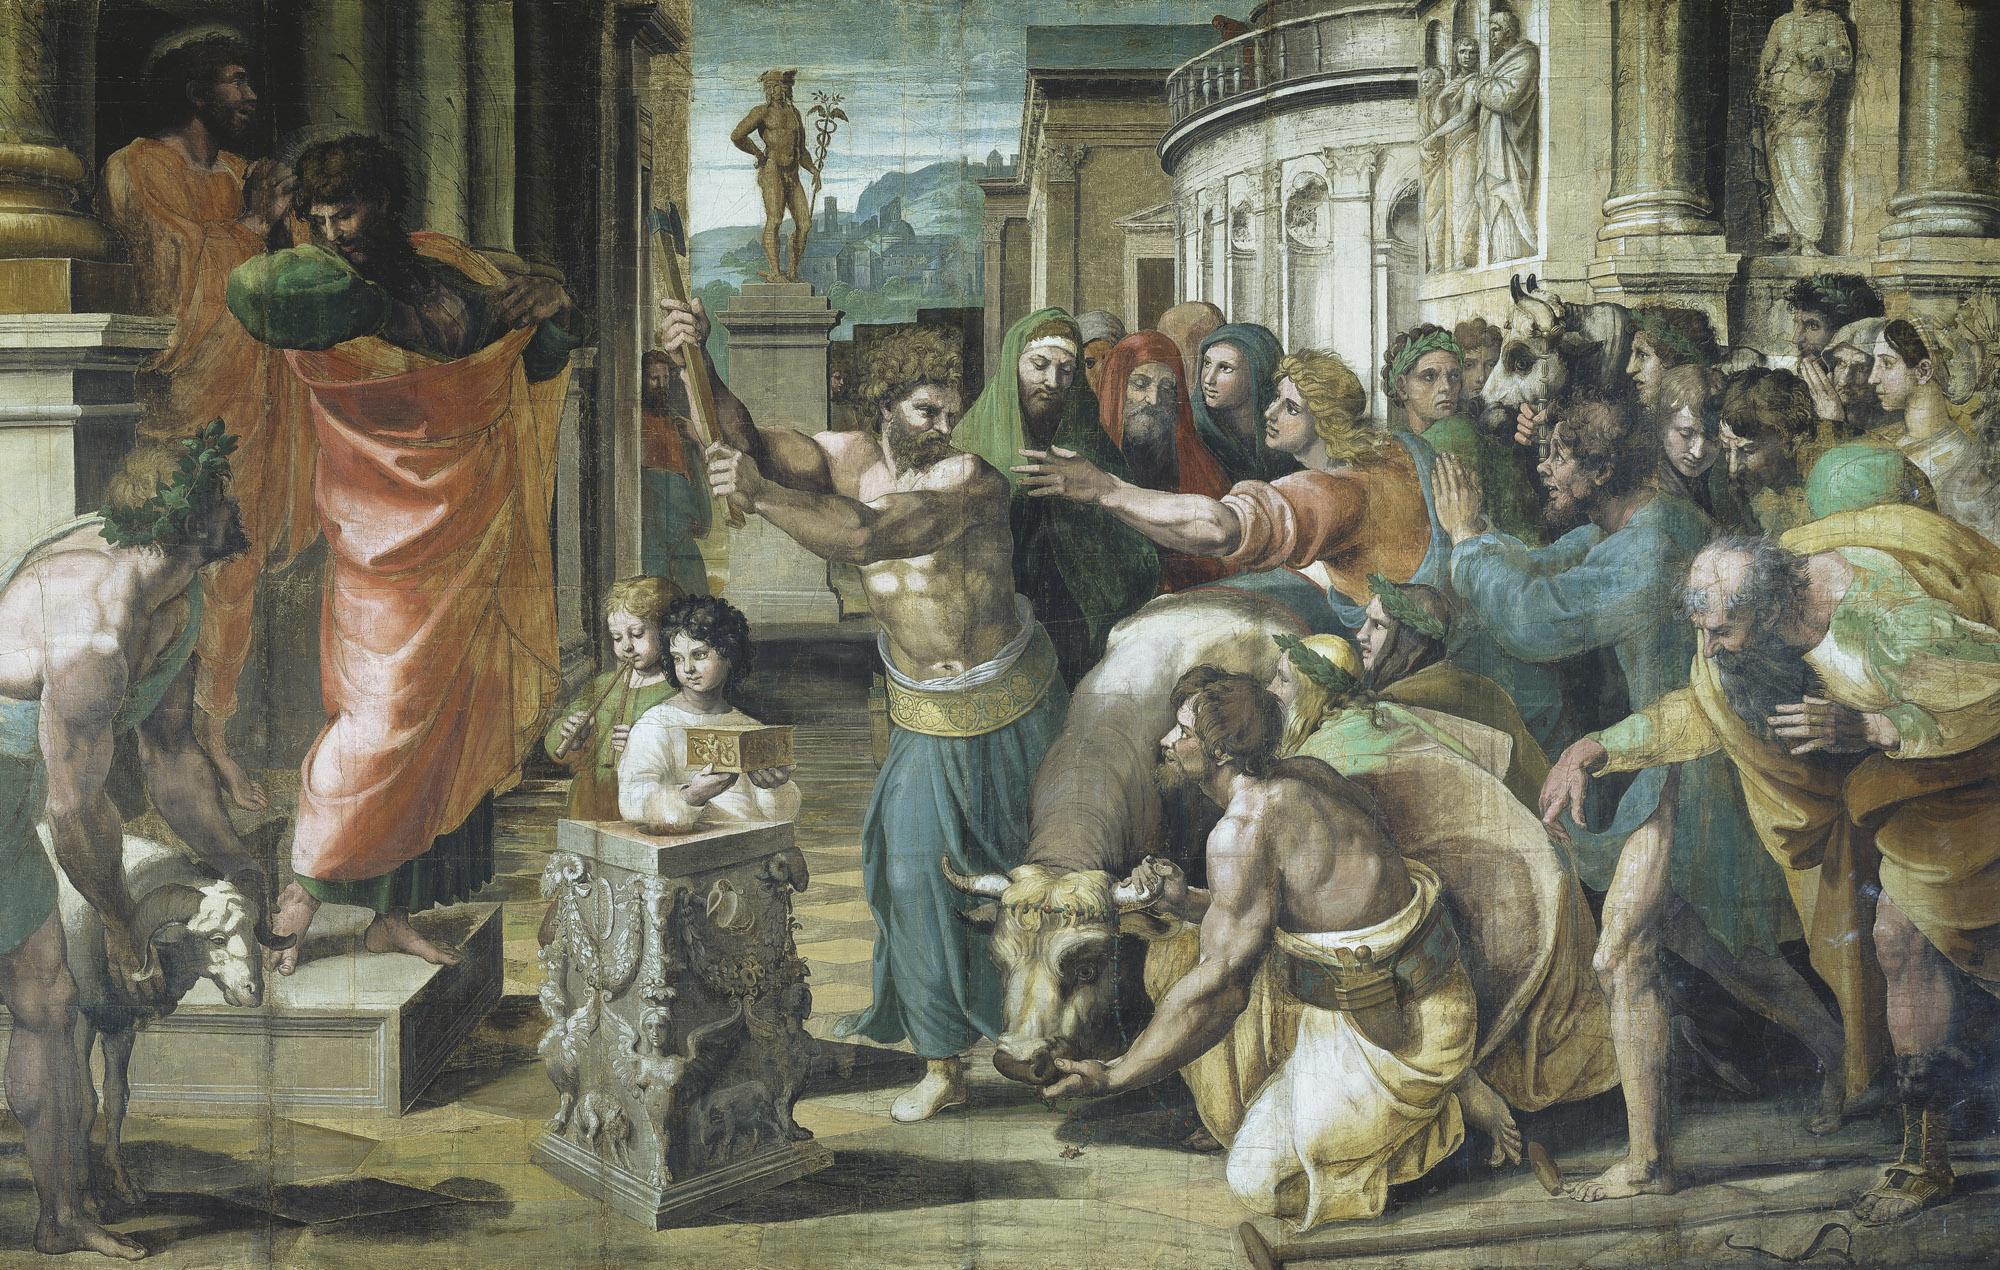 Raphael-Urbino---Painting---The Sacrifice at Lystra.jpg